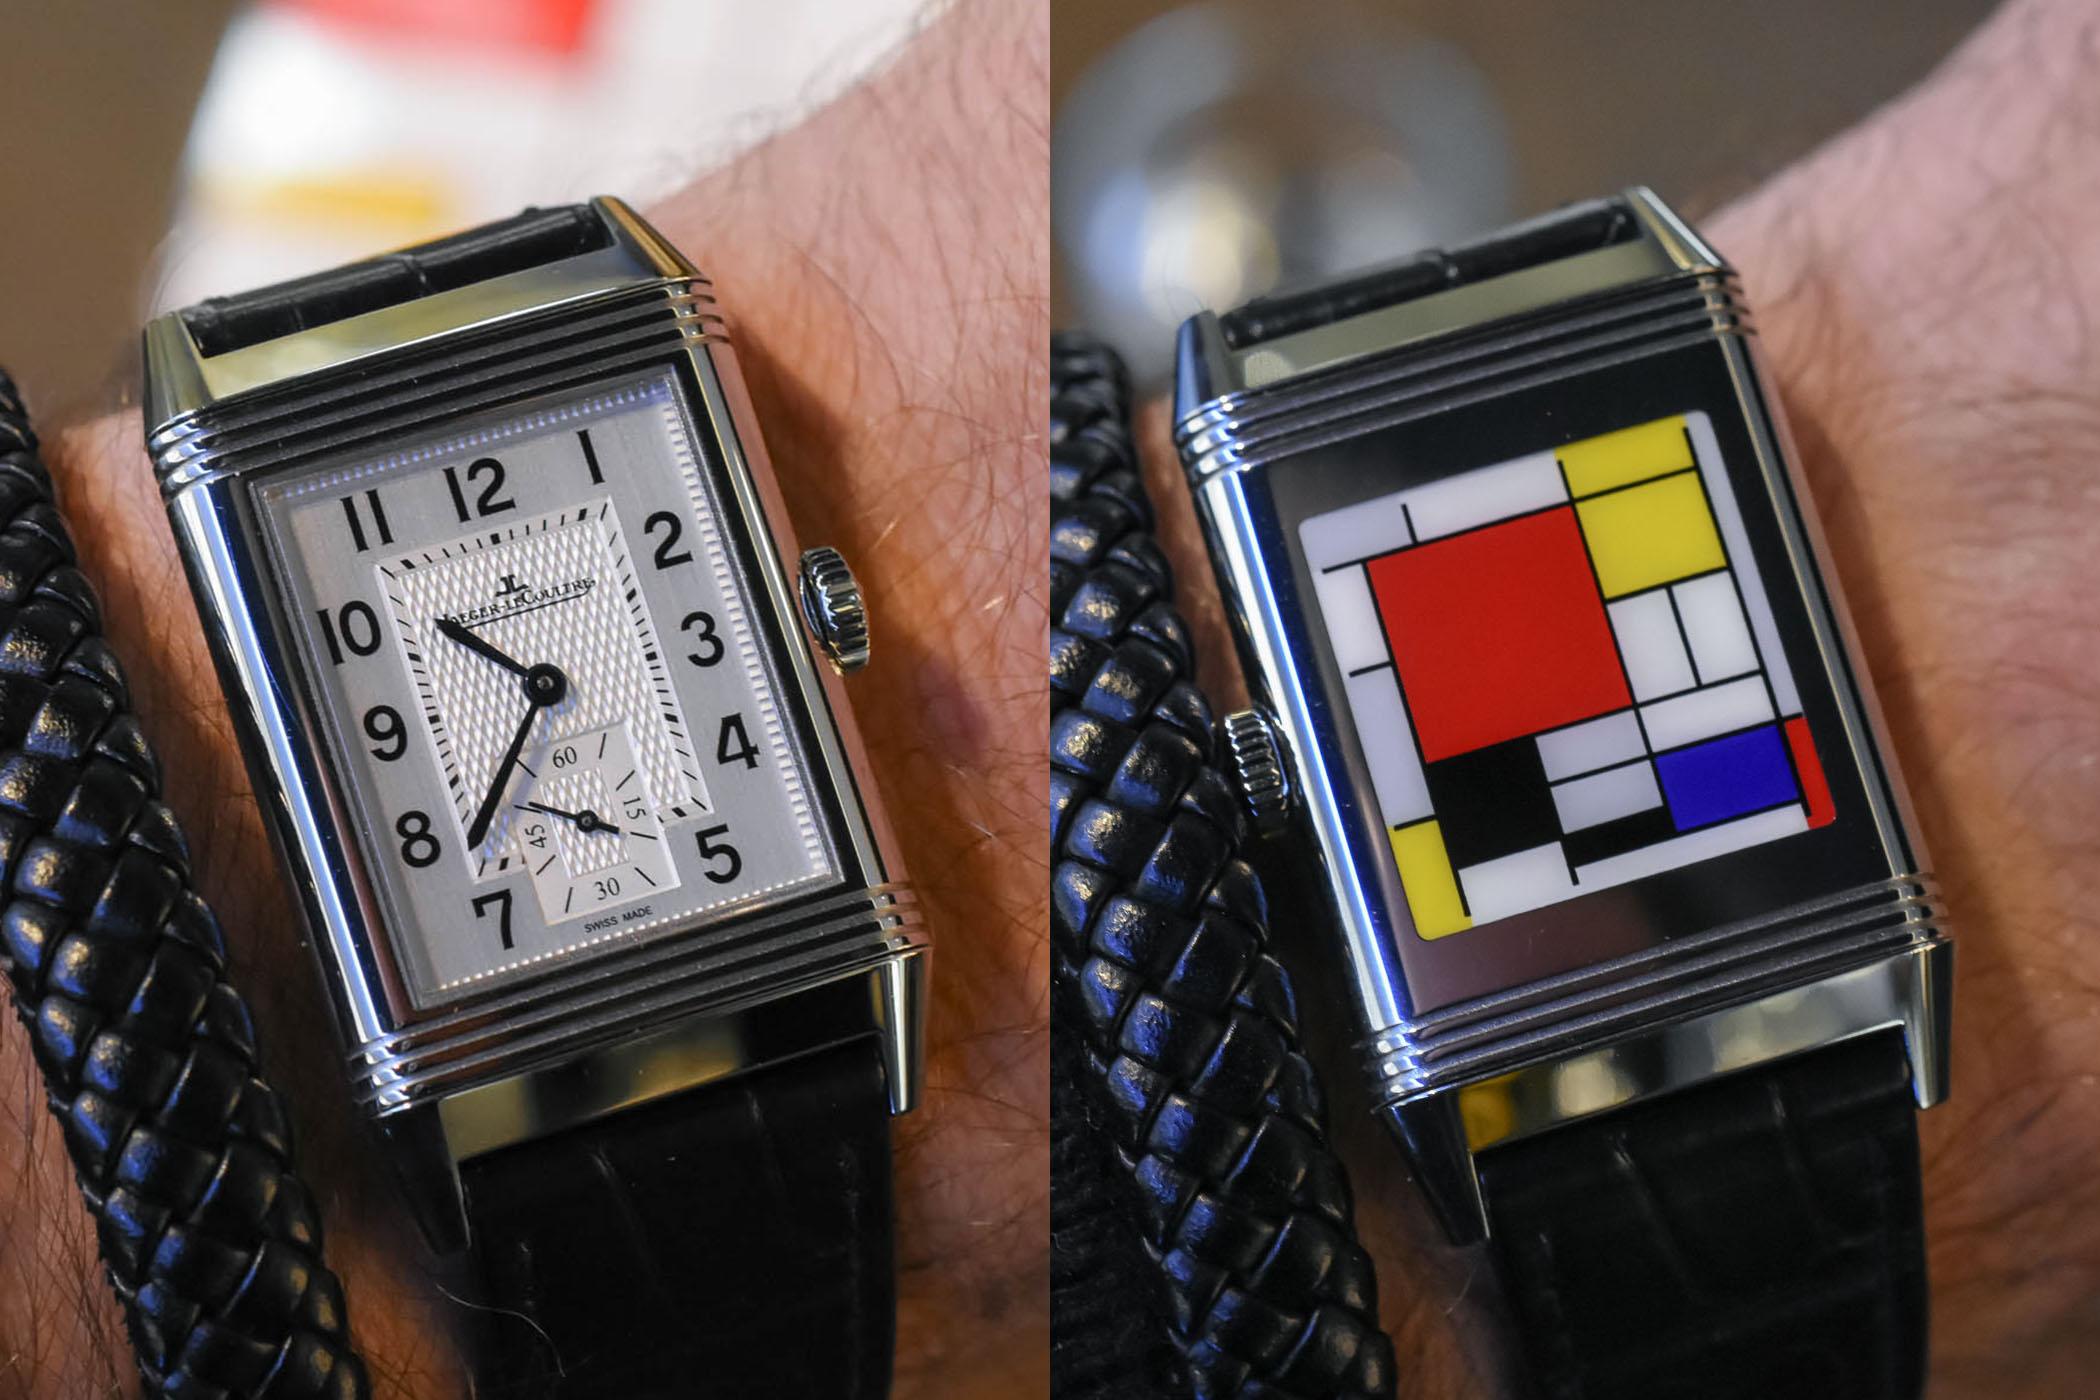 dede8b0e924 Jaeger-LeCoultre Reverso tribute to Piet Mondriaan De Stijl 100 years  Steltman